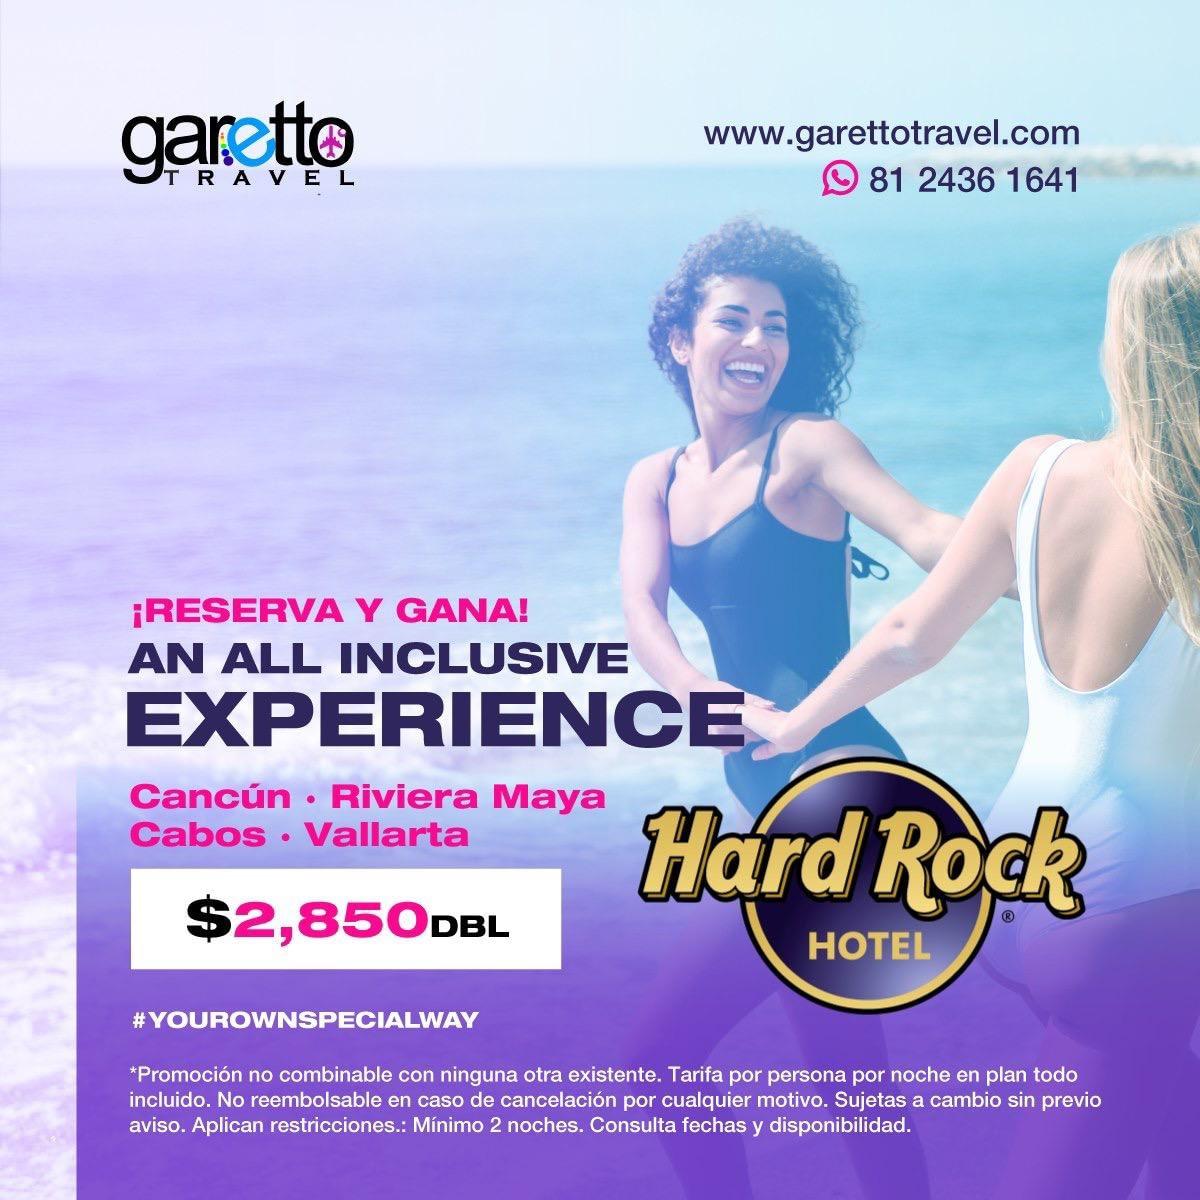 Hard Rock Hotel Garetto Travel